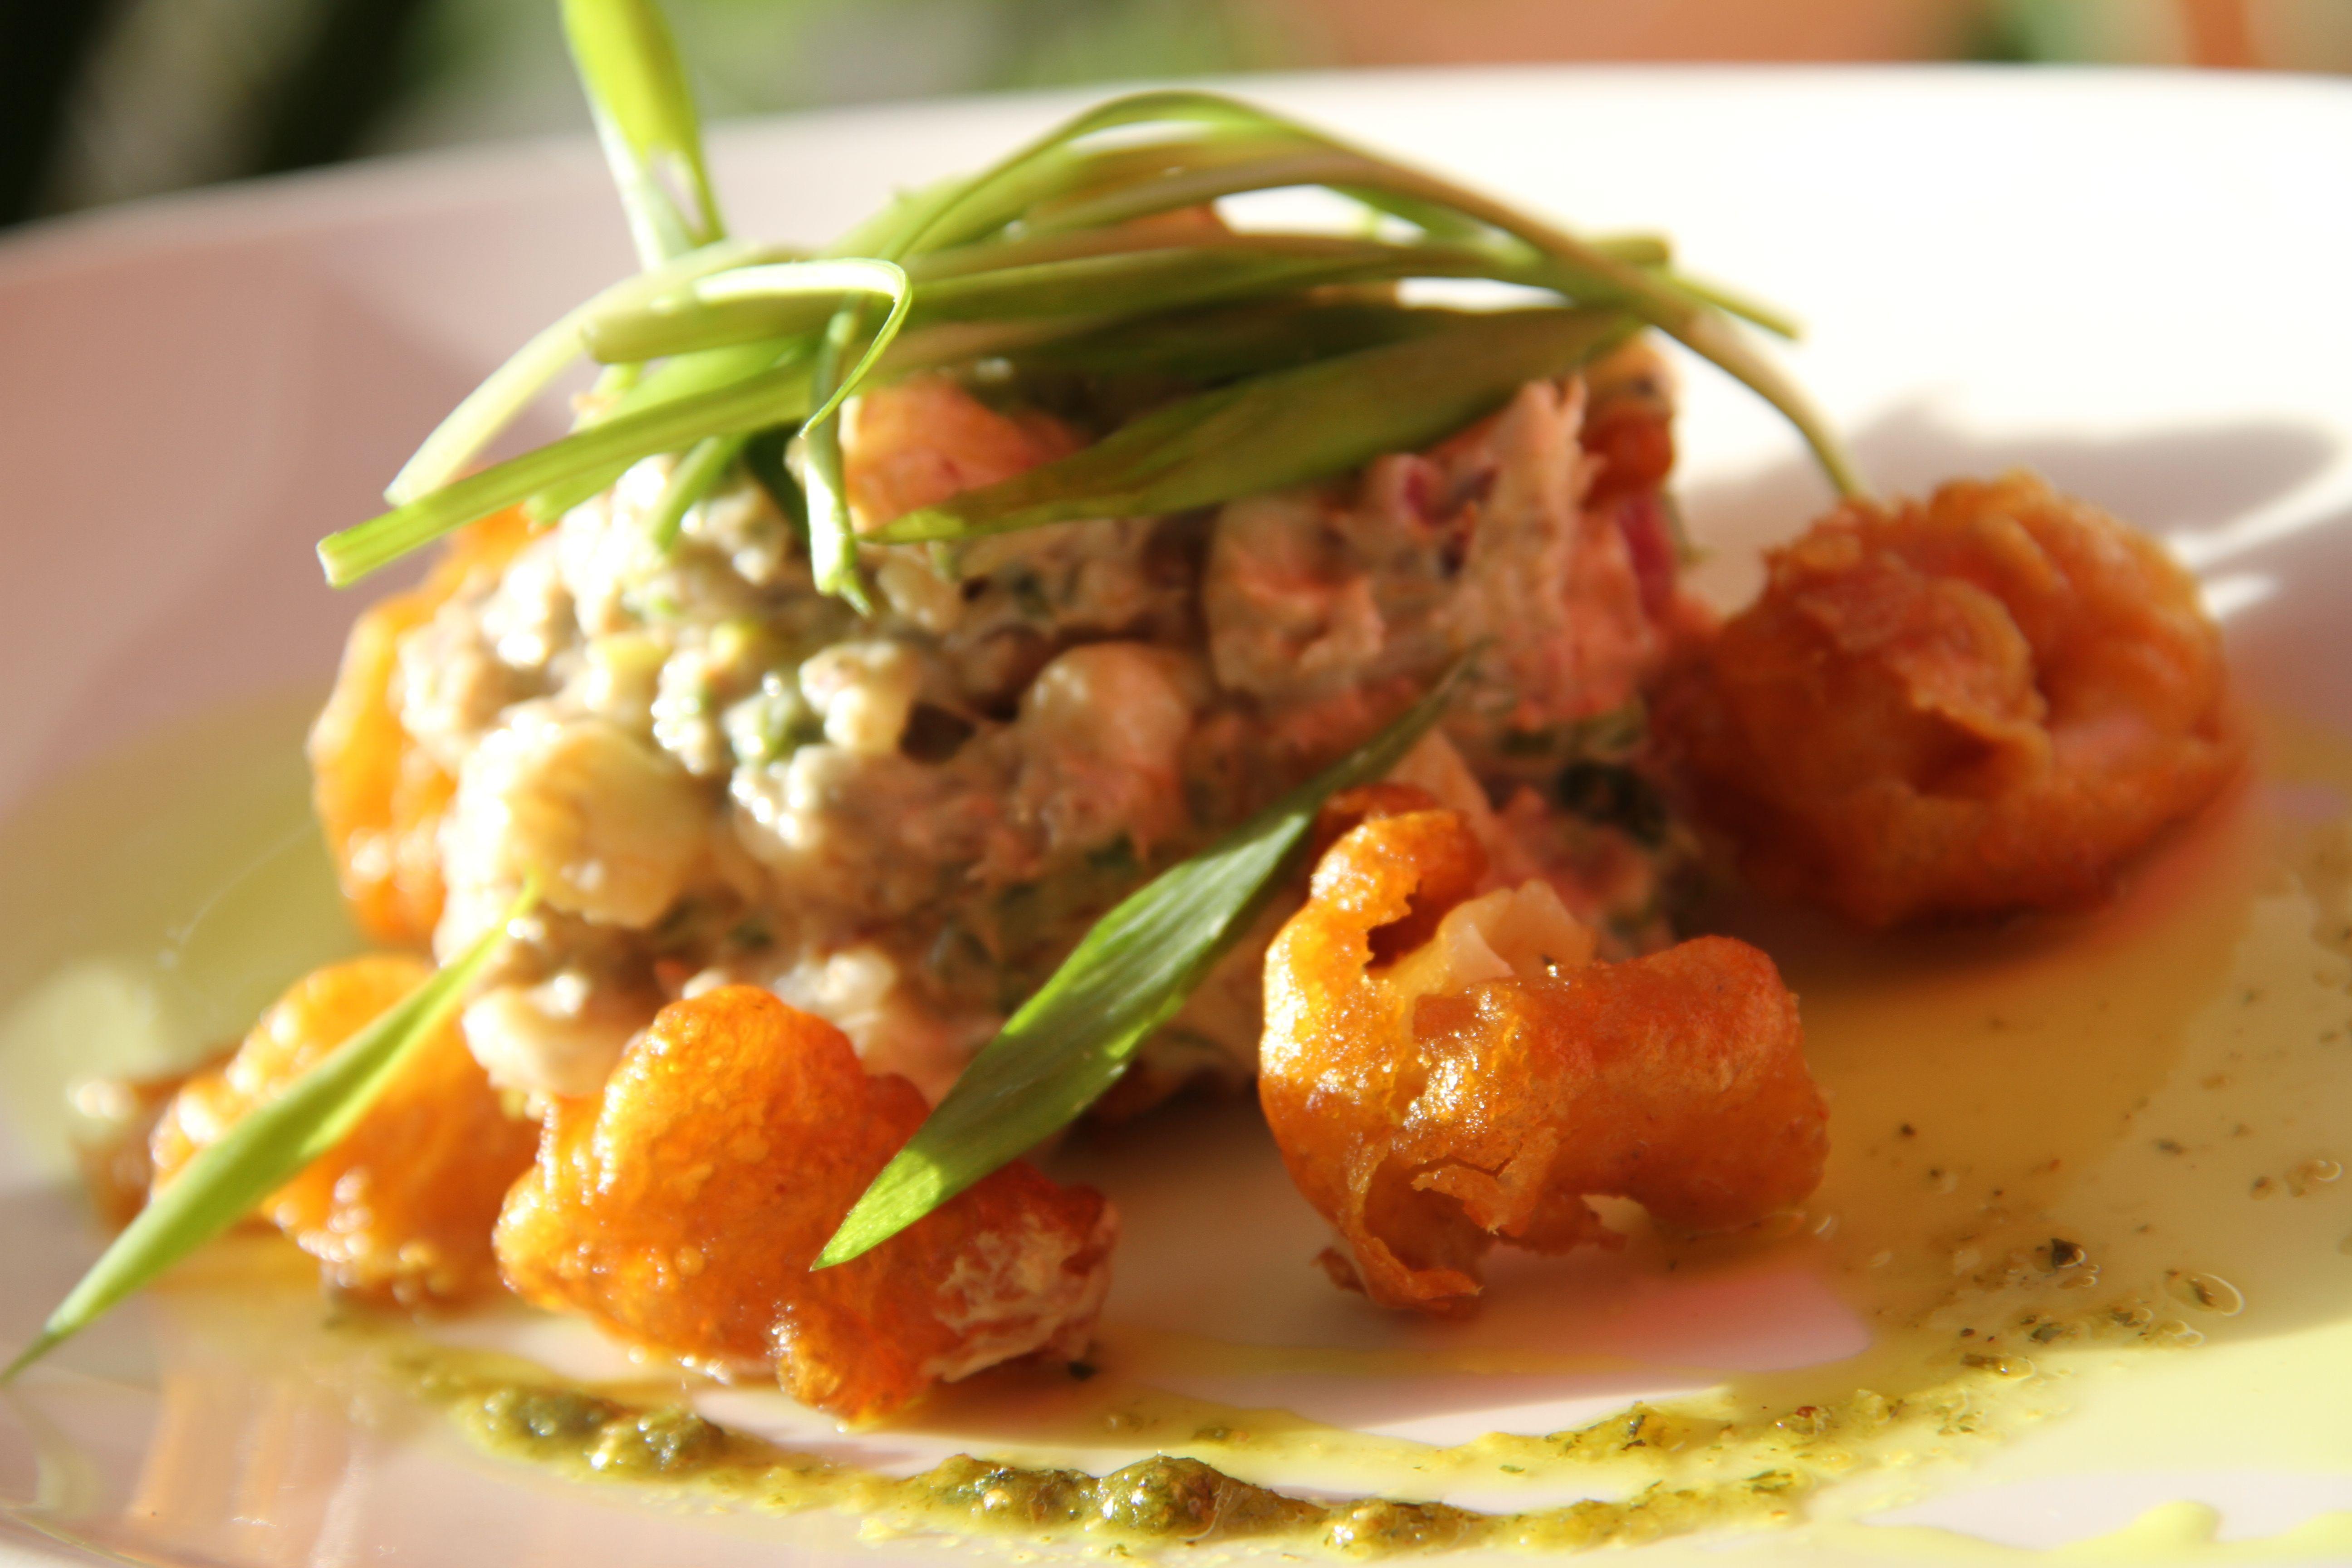 how to eat smoked herring